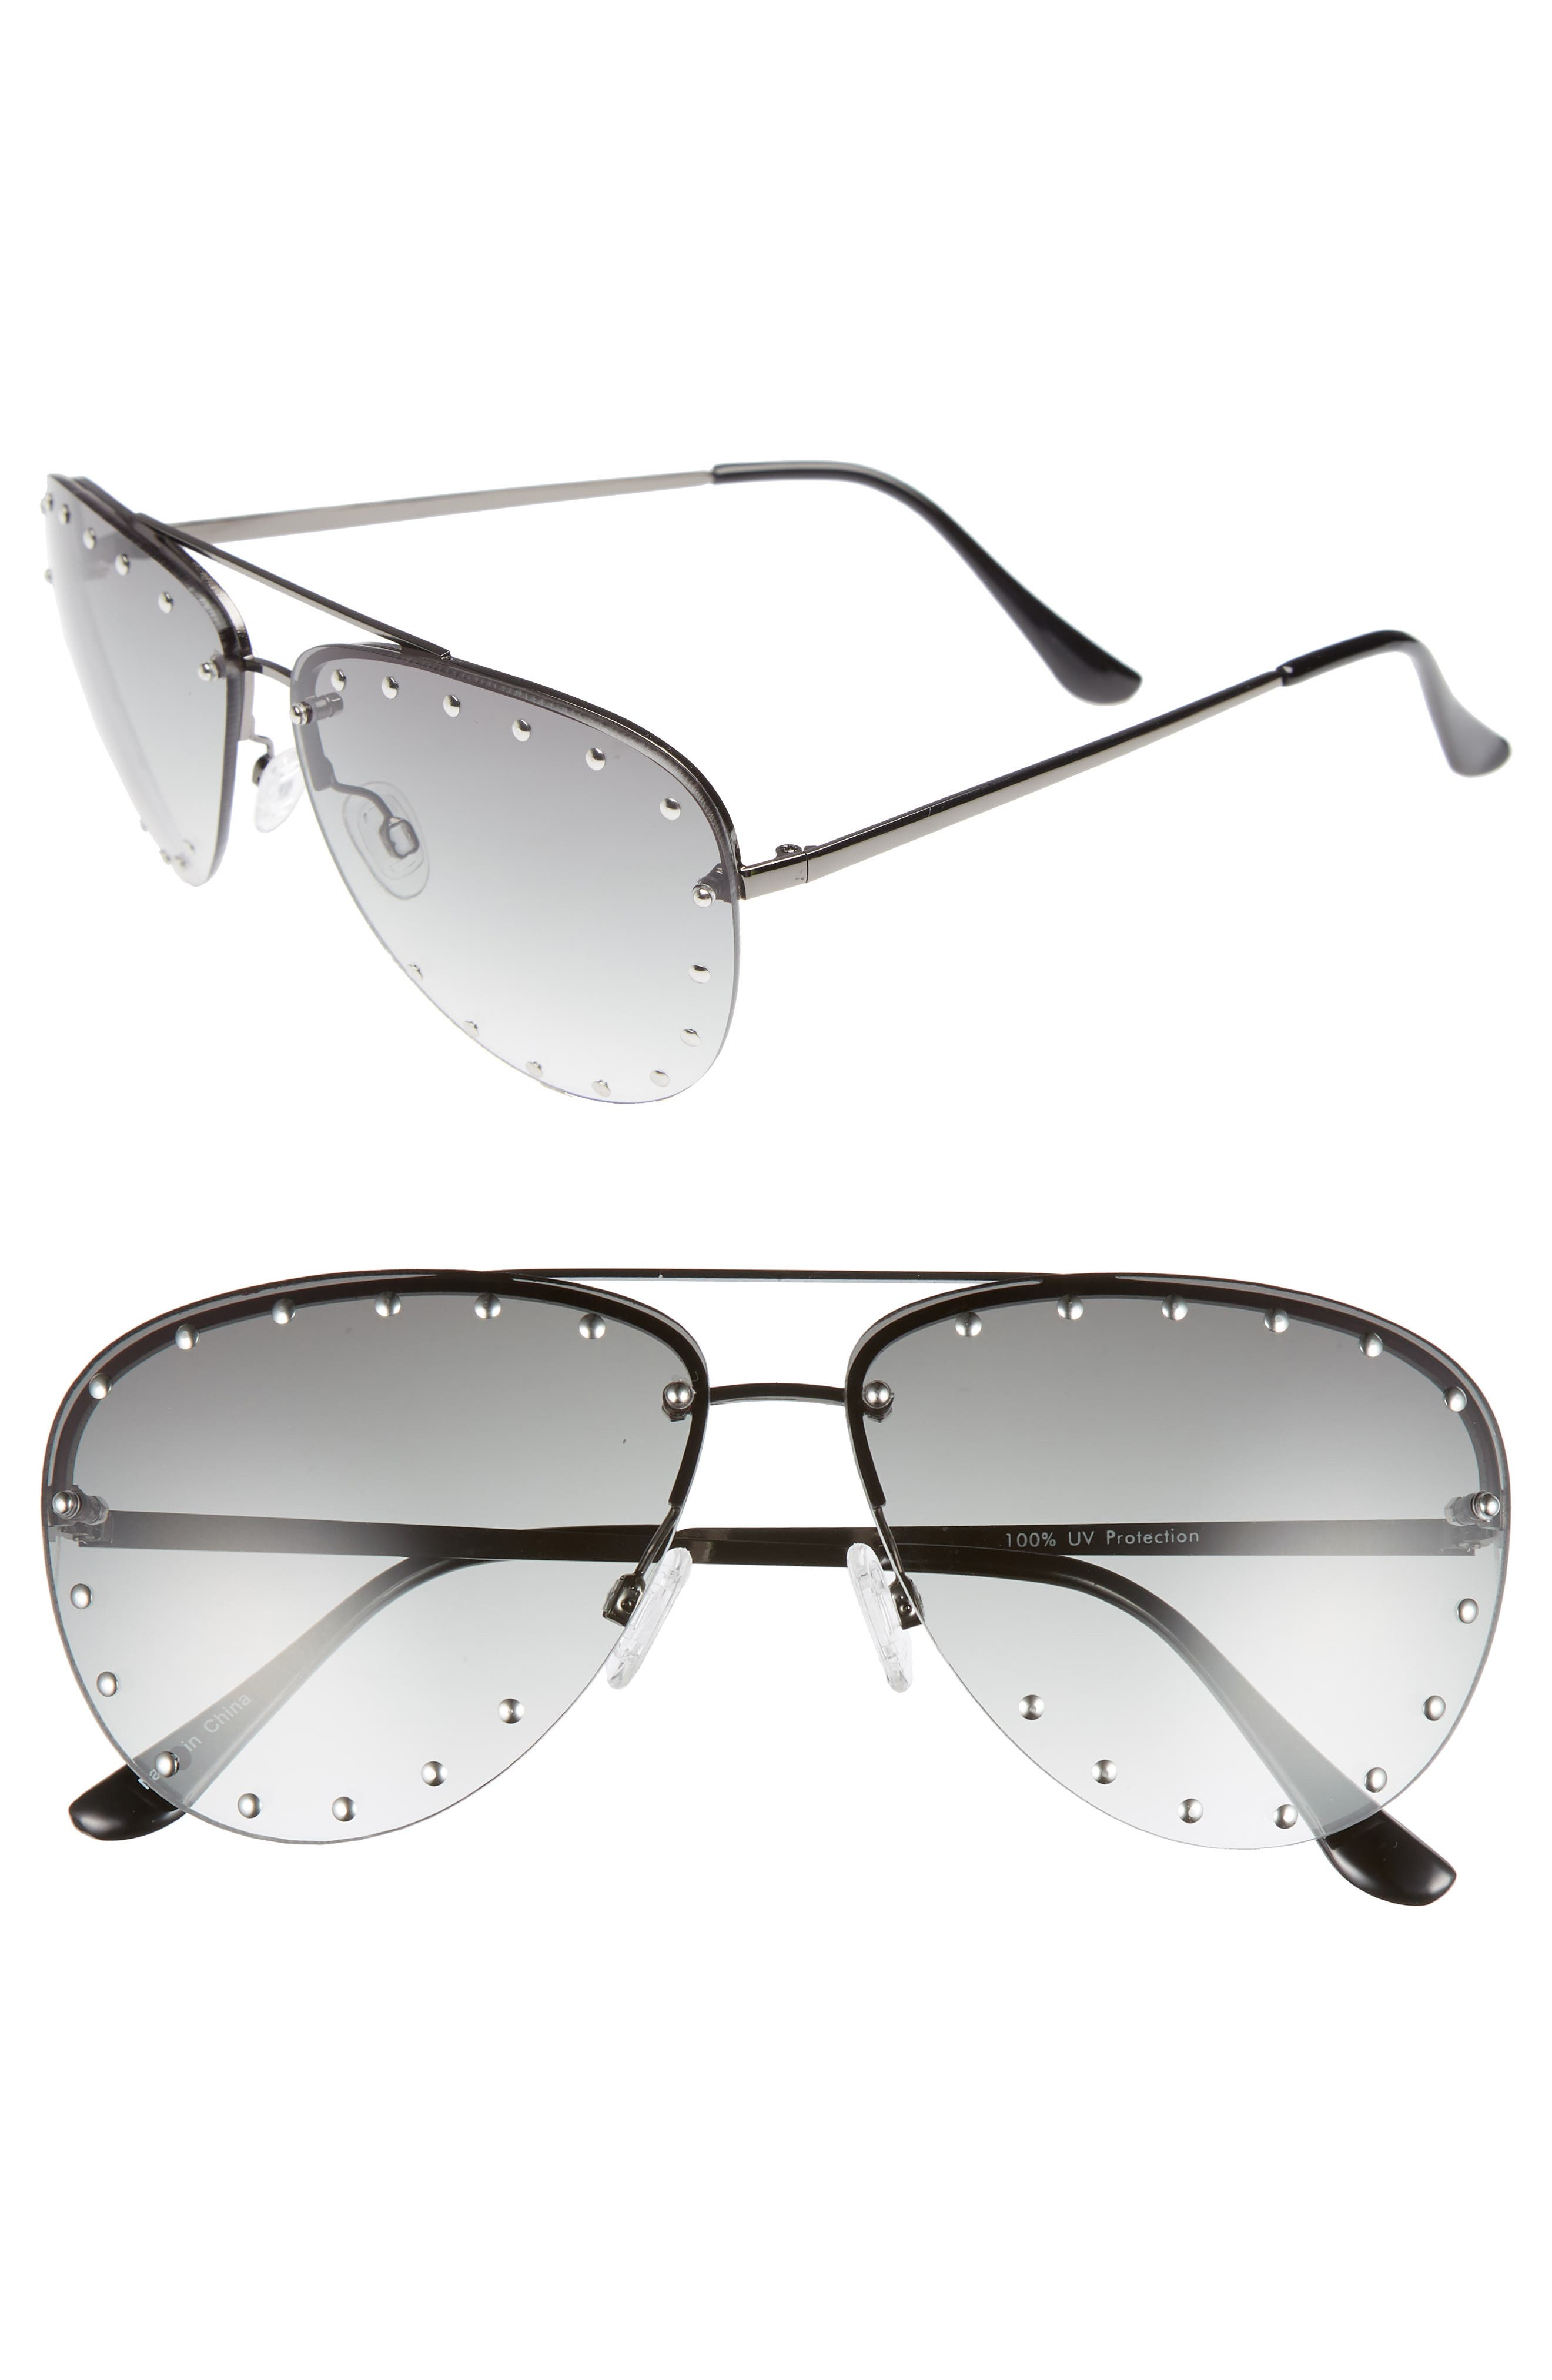 63mm Studded Aviator Sunglasses,                             Main thumbnail 1, color,                             Silver/ Green